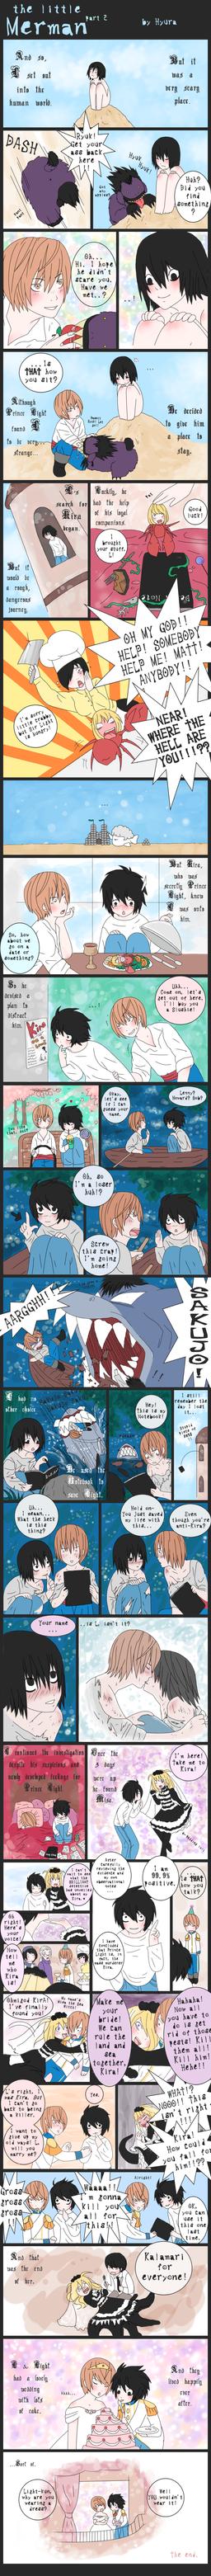 DN - The Little merman p.2 by Hyura